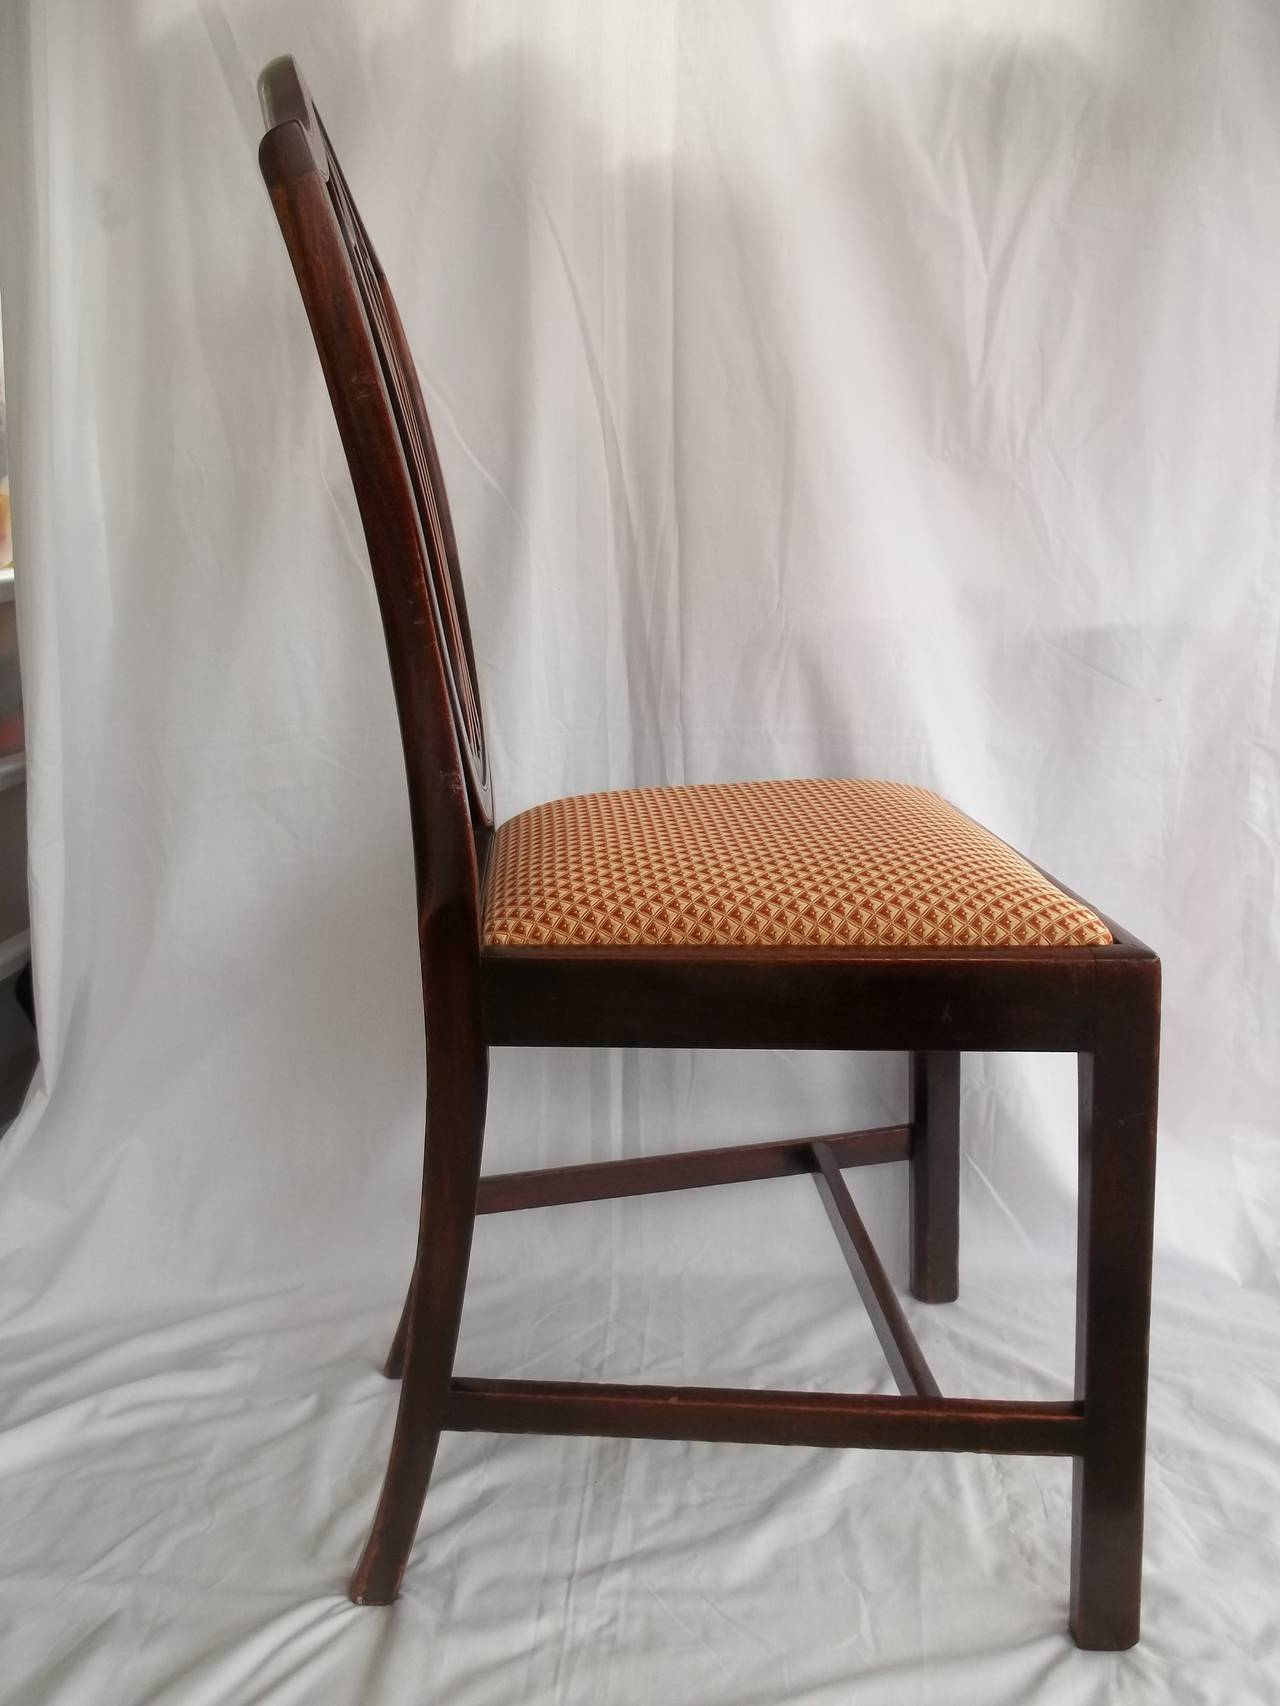 Elegant 18th Century Hepplewhite Side Chair in Mahogany, English circa 1785 For Sale 1